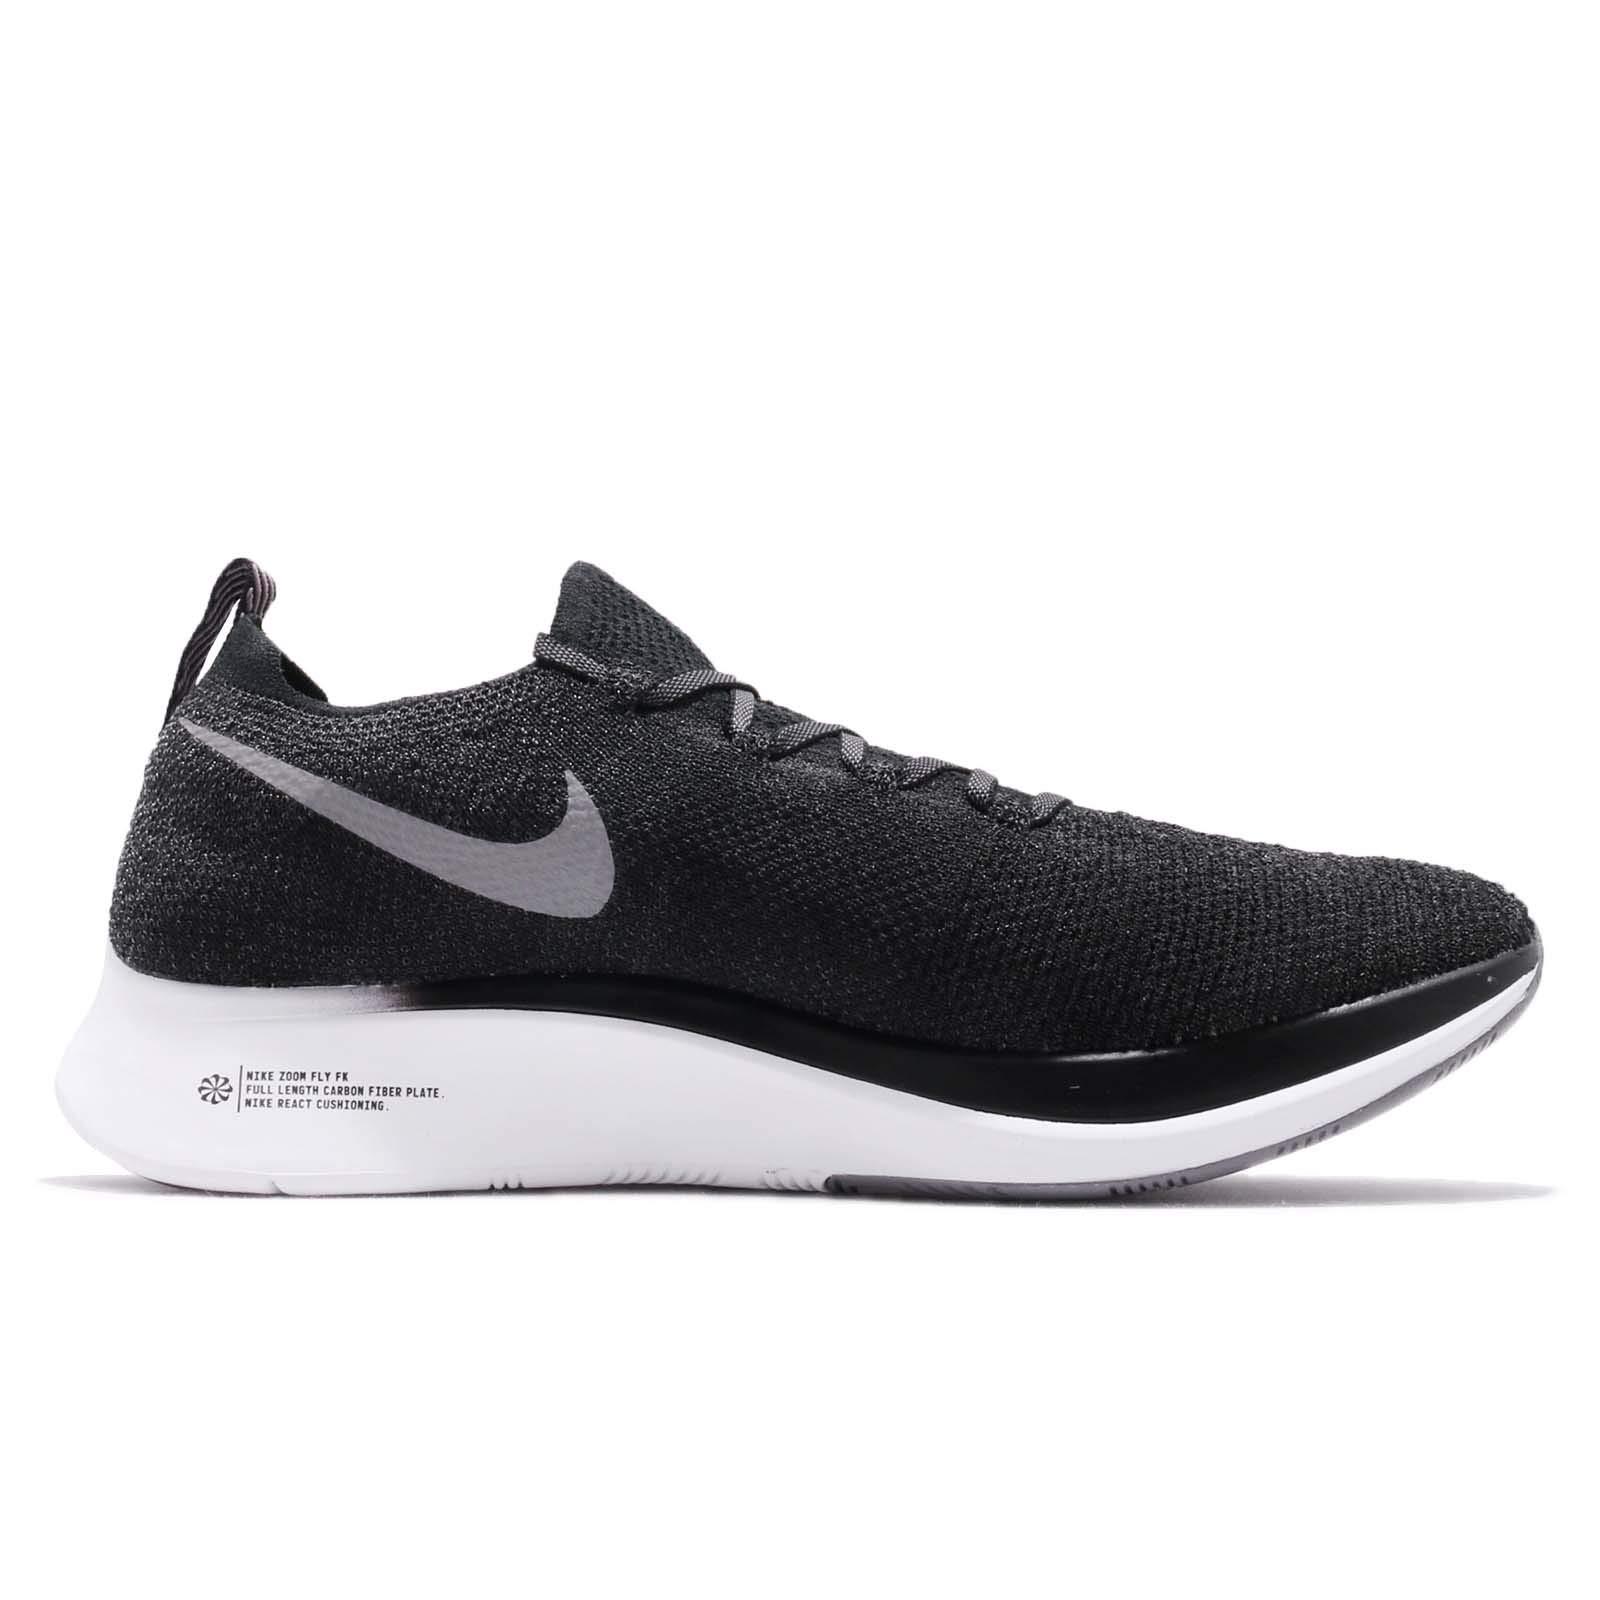 Nike Zoom Fly Flyknit Men's Running Shoe Black/Gunsmoke-White Size 7.5 by Nike (Image #2)